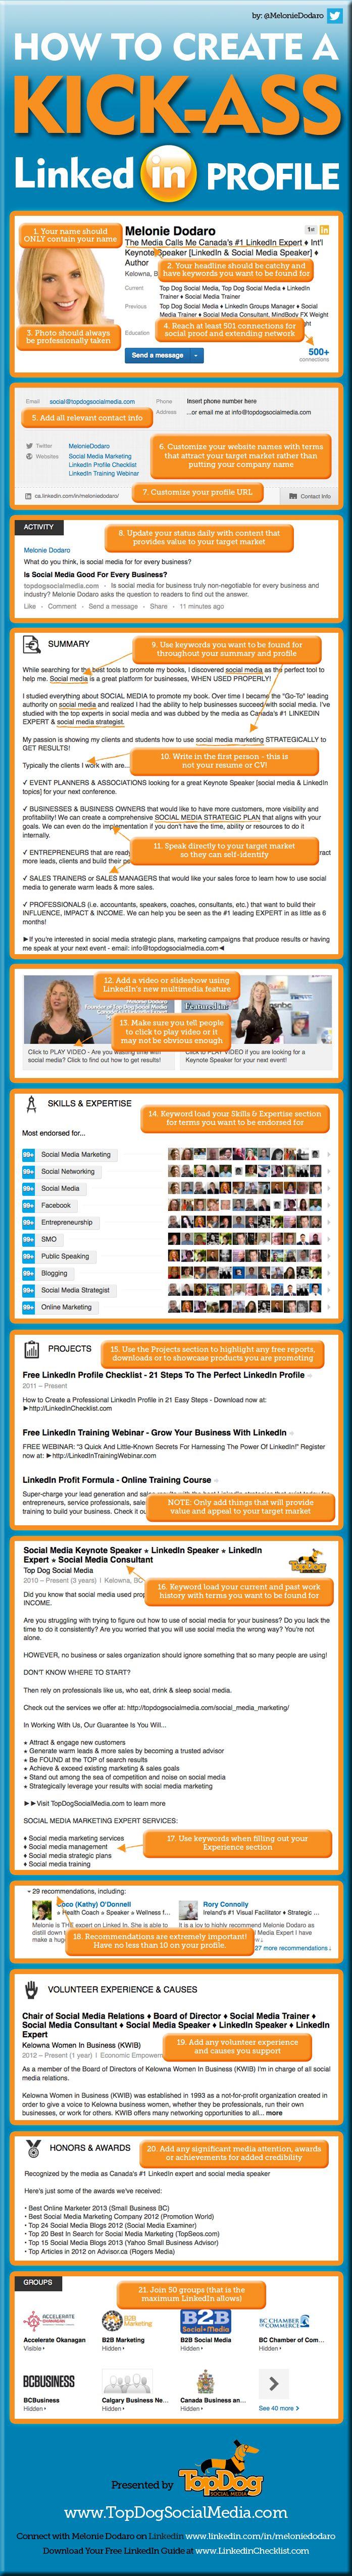 resume Linkedin Generate Resume 21 linkedin profile tips that make you look awesome how to create a kick ass linkedin